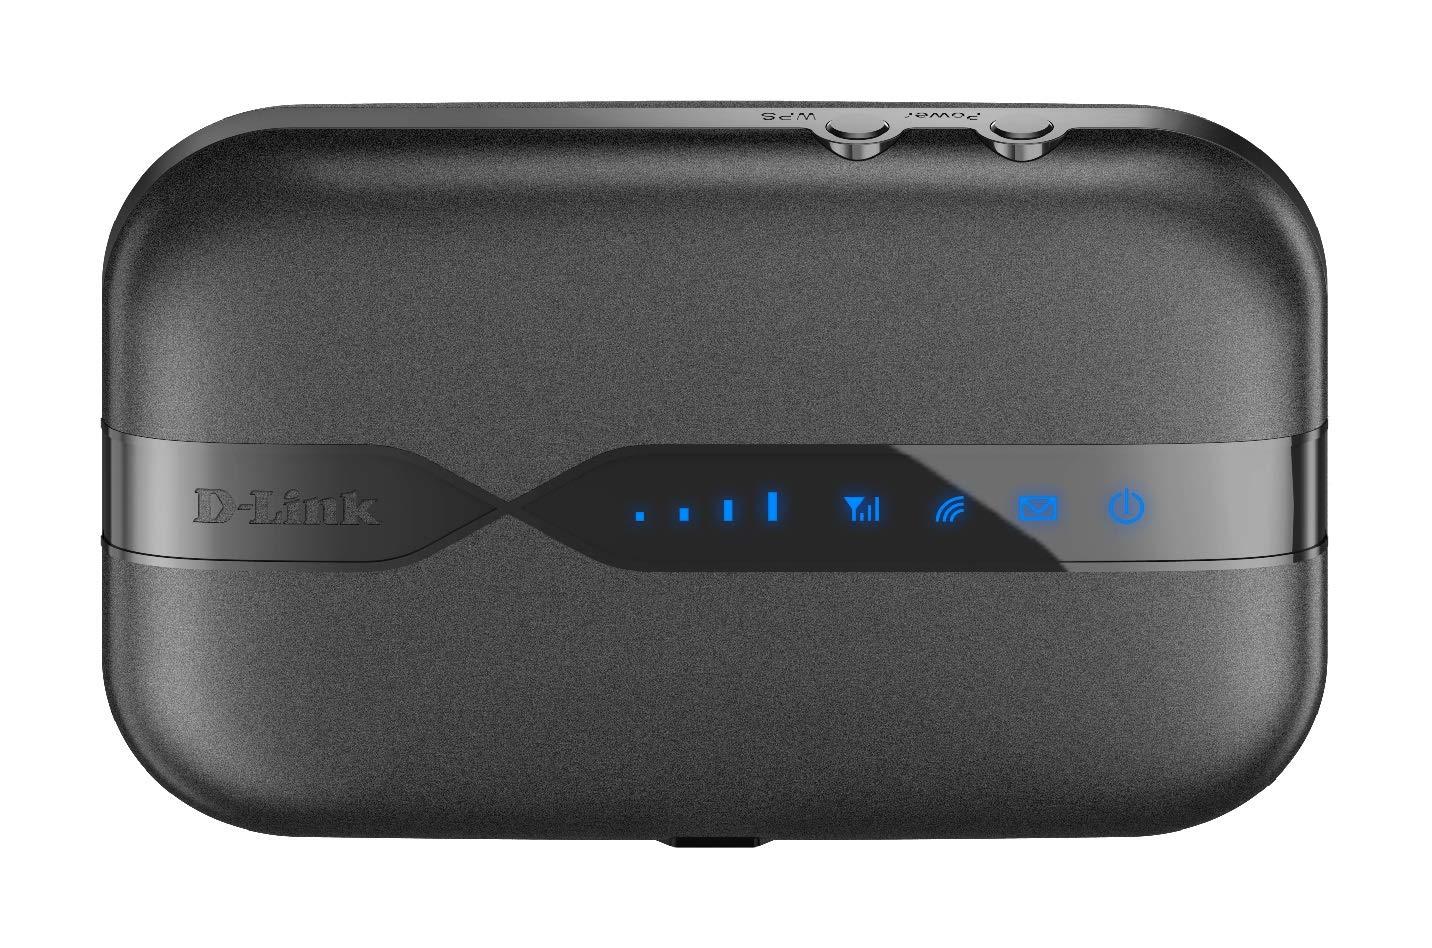 D-Link DWR-932 Mobile Wi-Fi 4G Hotspot 150mbps